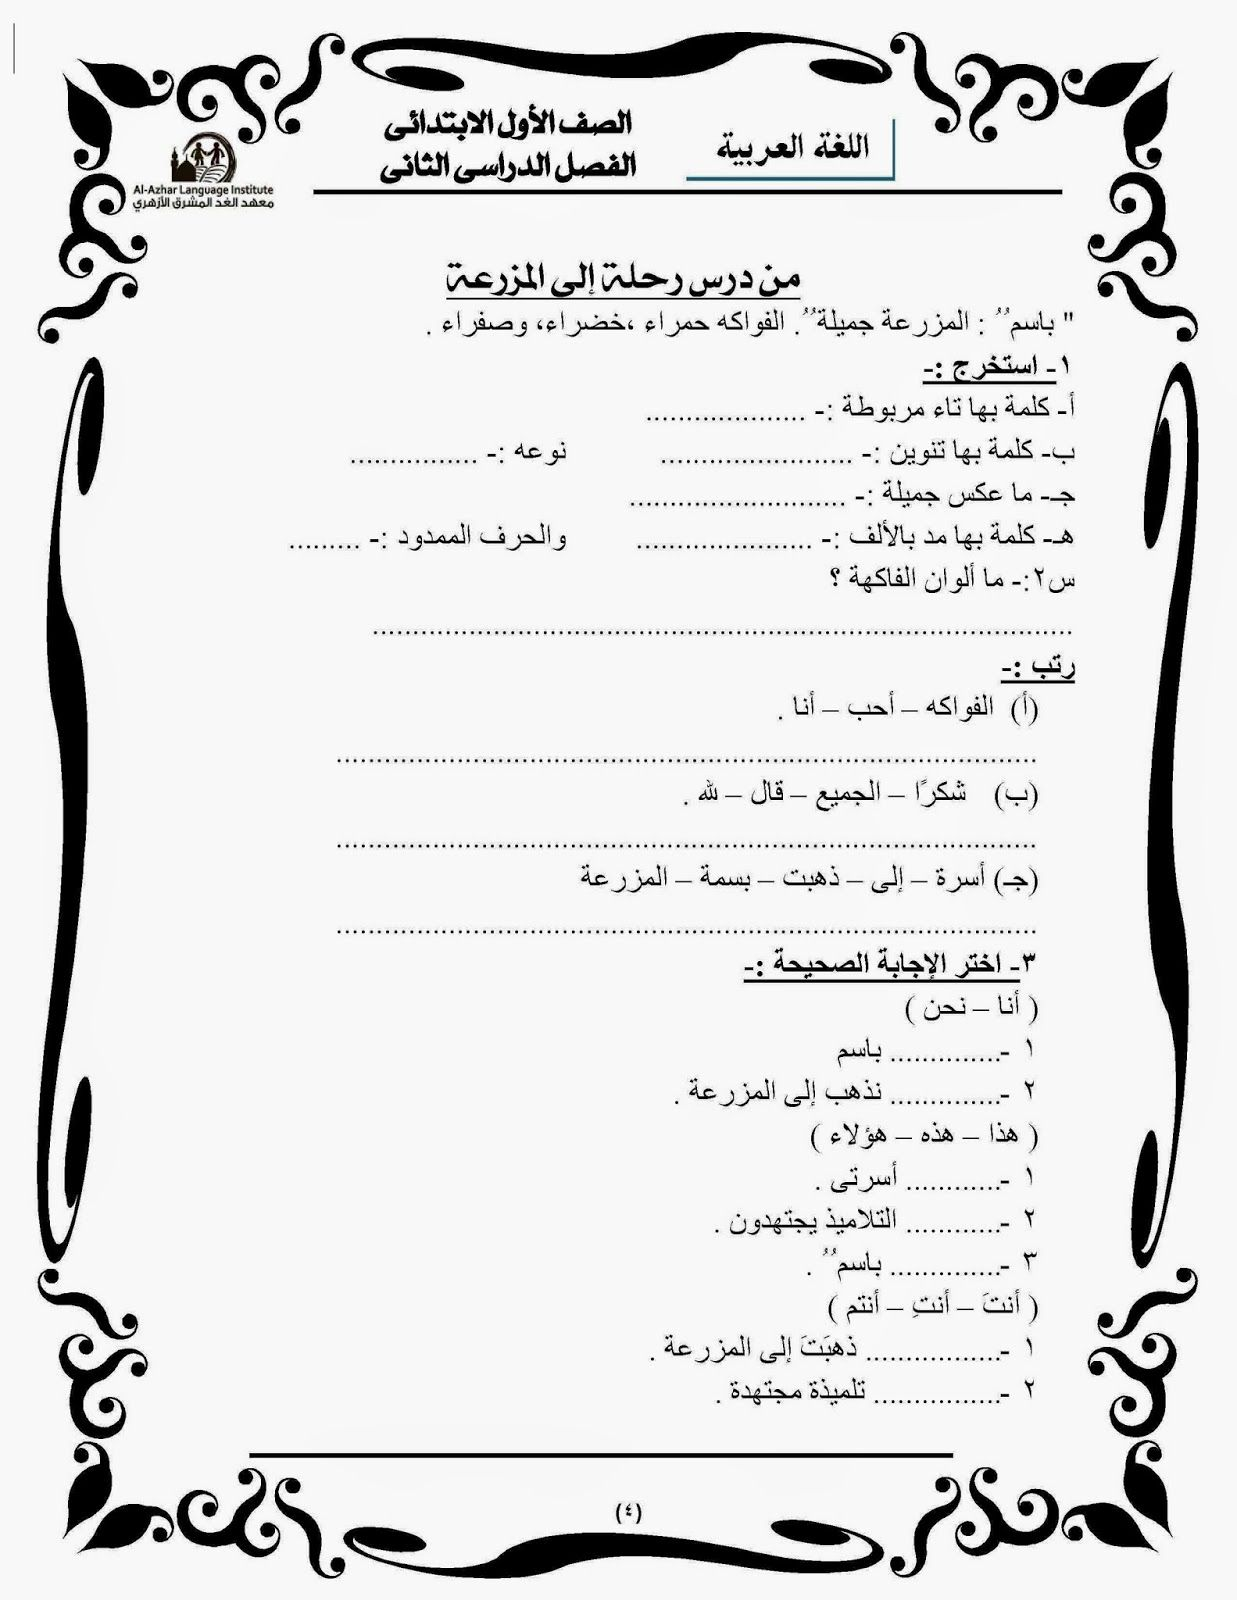 pin by naima mustapha on arabic worksheet arabic lessons learning arabic arabic language. Black Bedroom Furniture Sets. Home Design Ideas